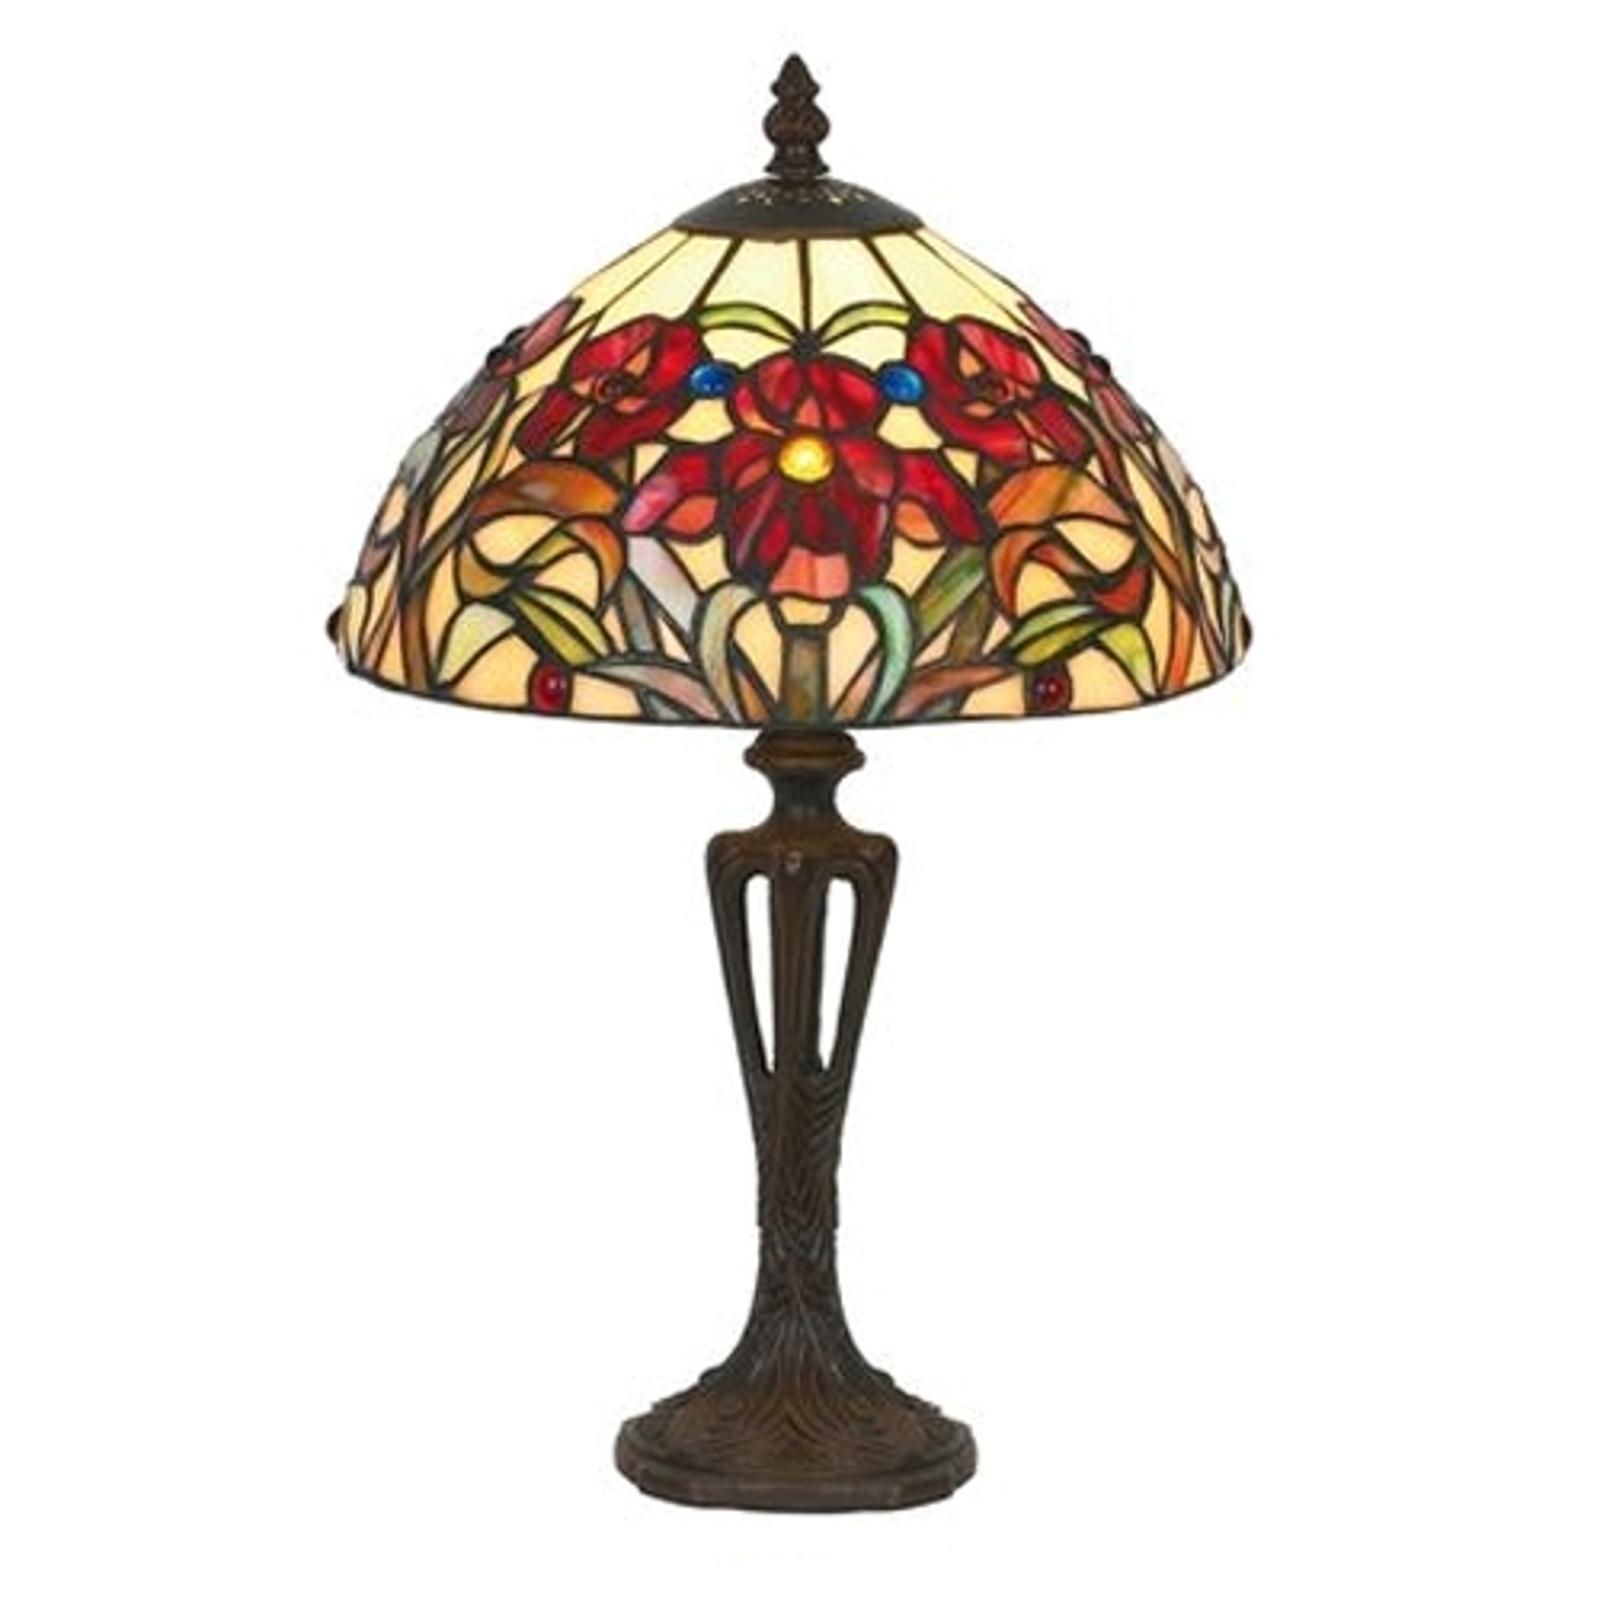 ELINE classic Tiffany style table lamp, 40 cm_1032169_1